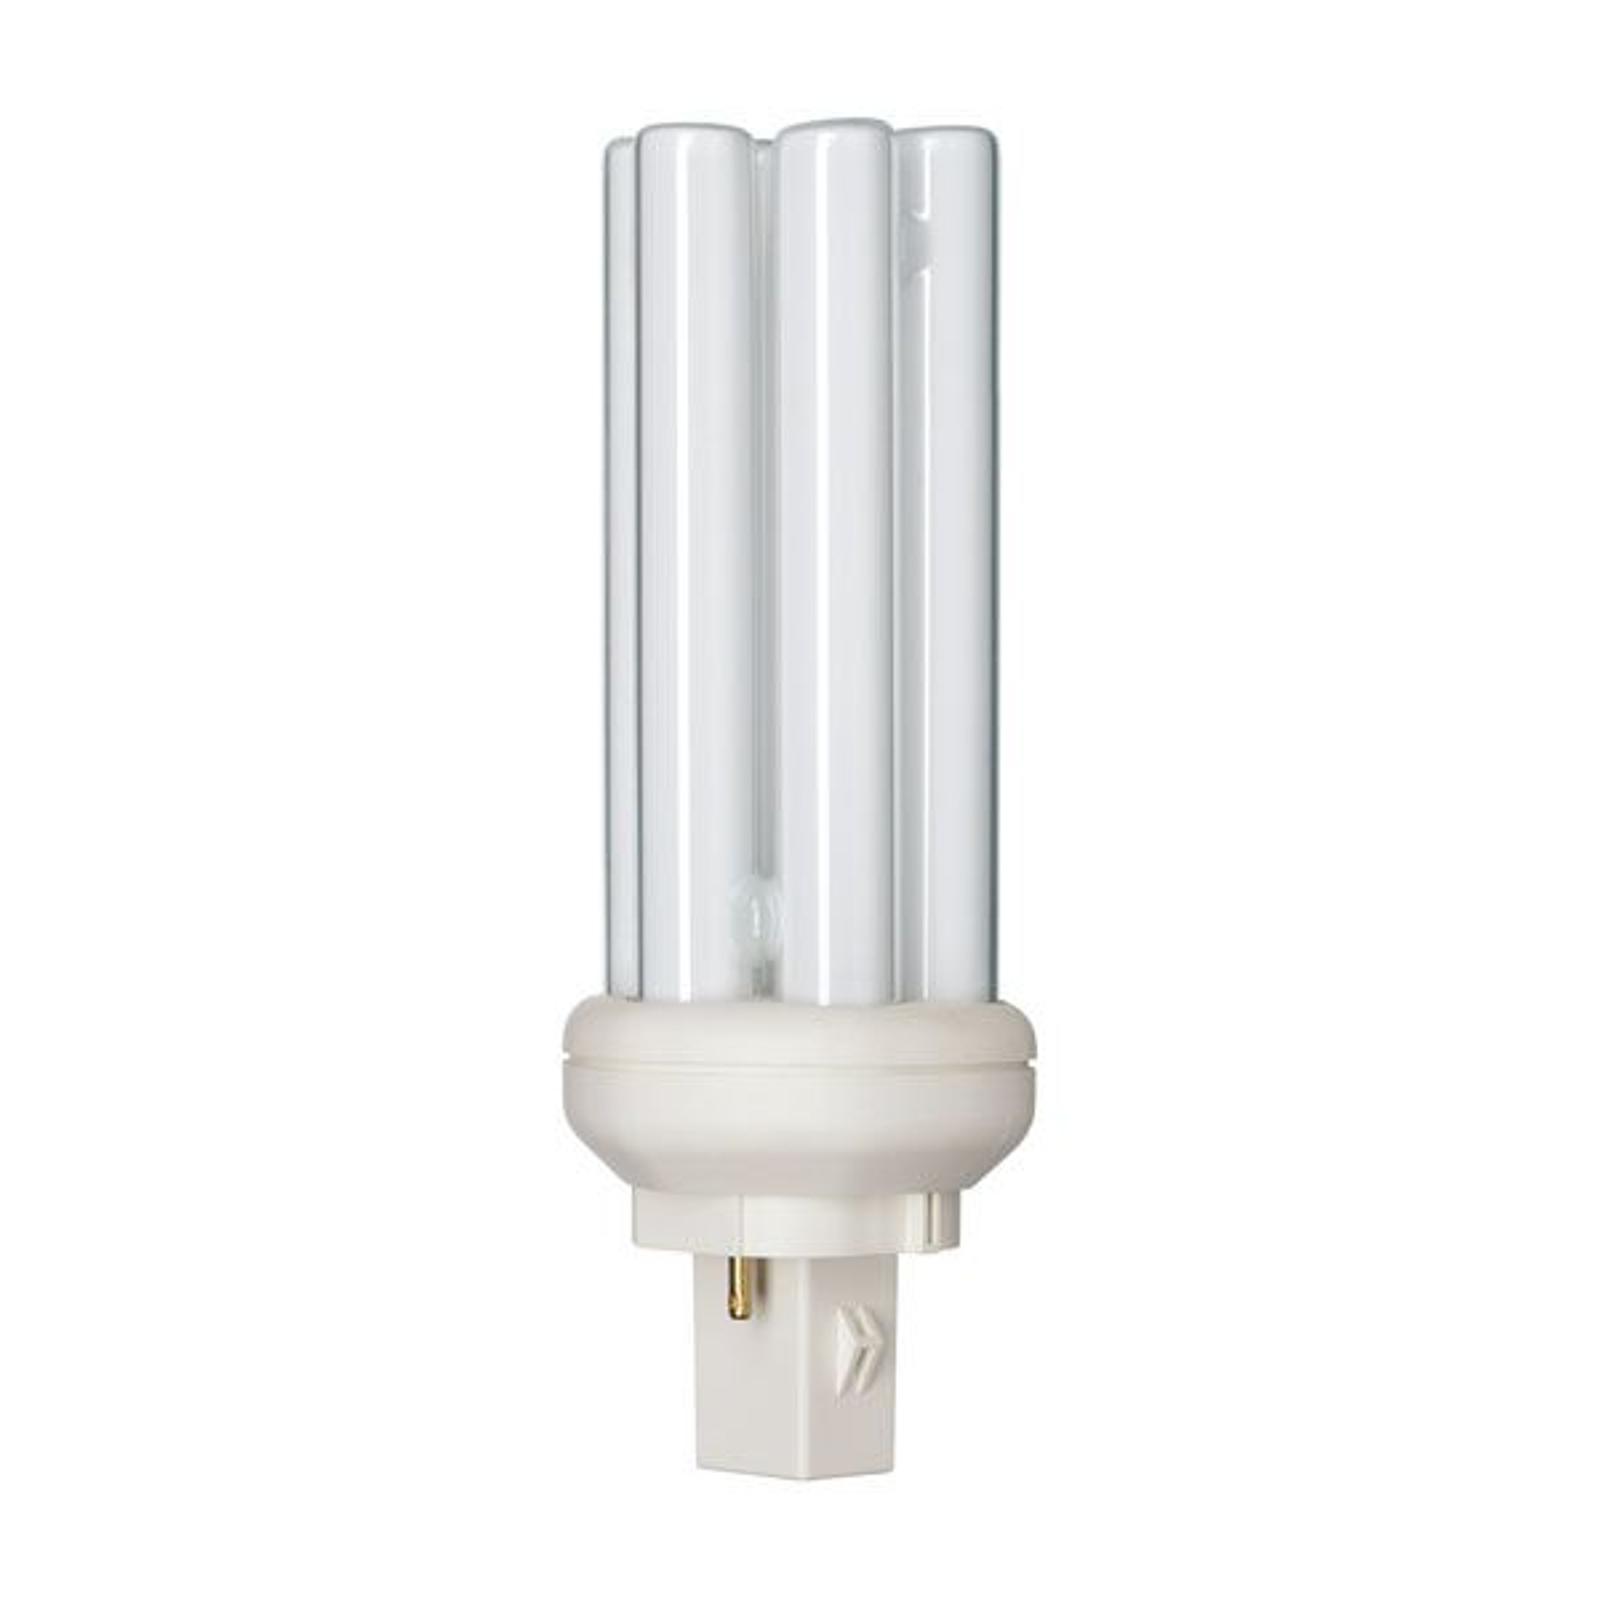 GX24d Kompaktleuchtstofflampe Master 18W PL-T 830